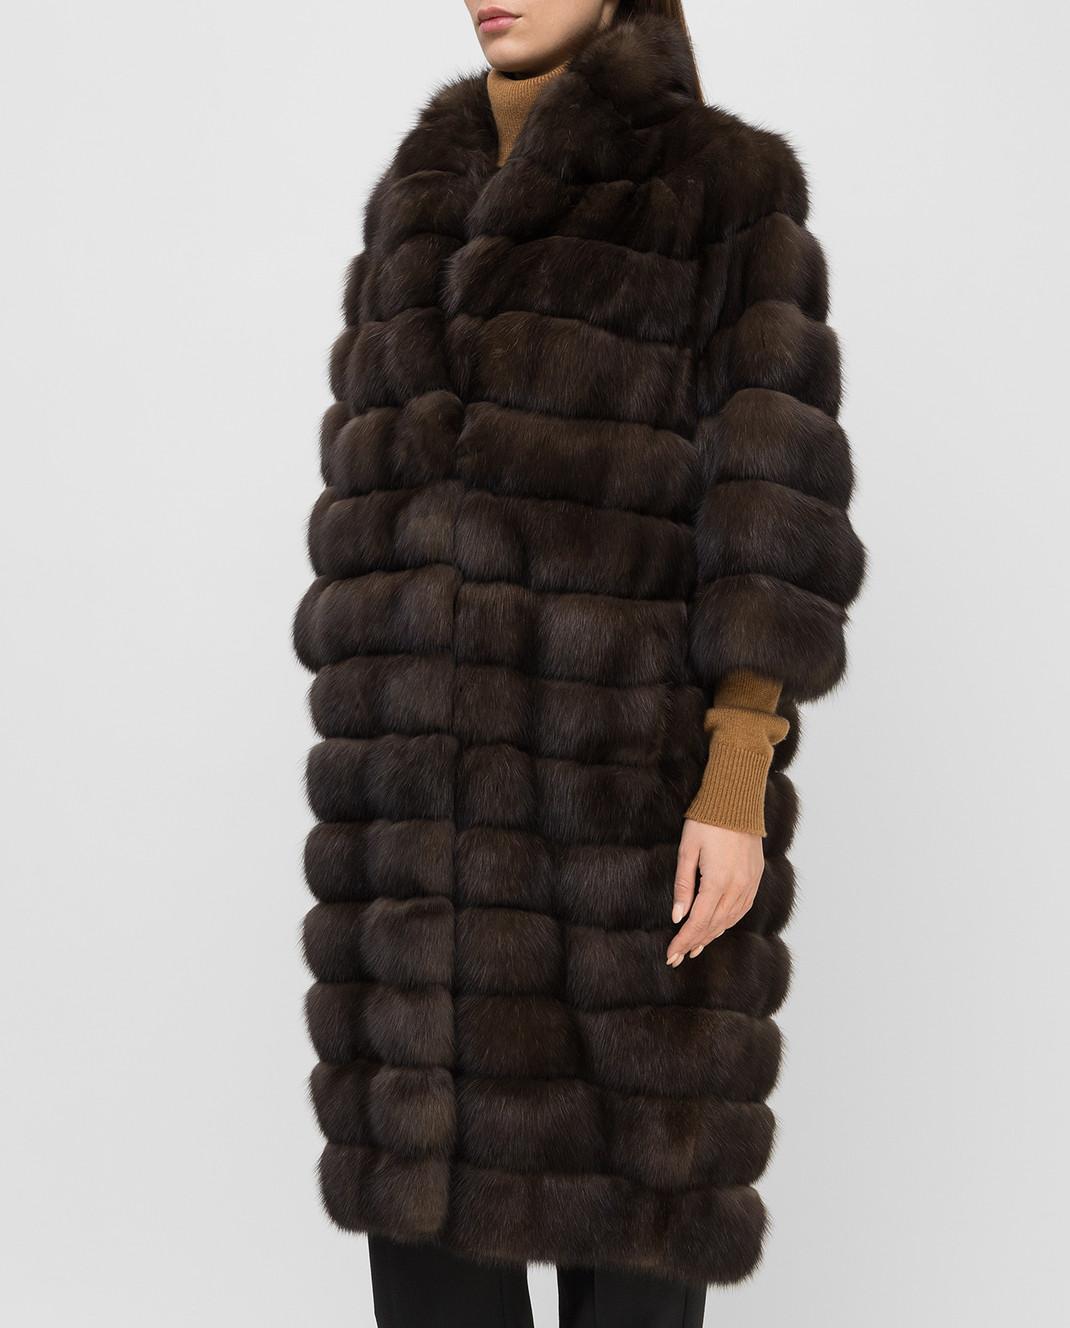 Real Furs House Темно-коричневая шуба из соболя 24342SILVERY изображение 3